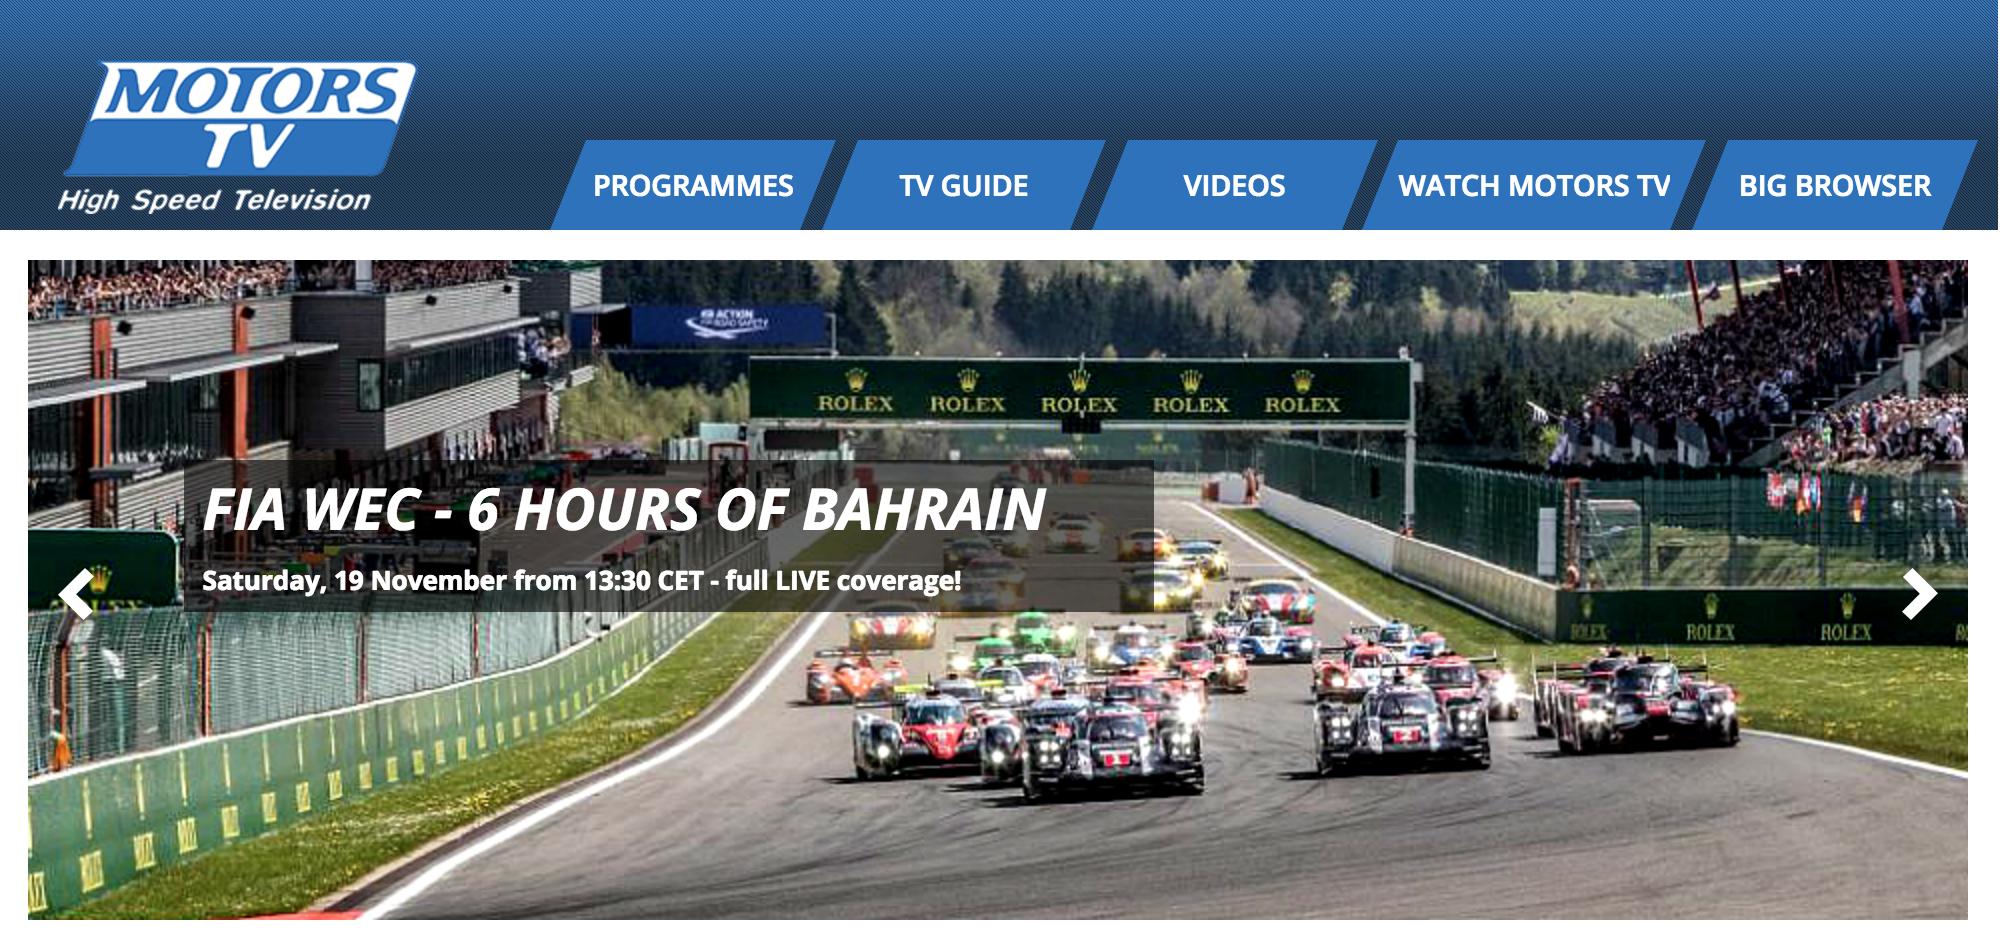 Motorsport Network Owns Motors TV as of Today